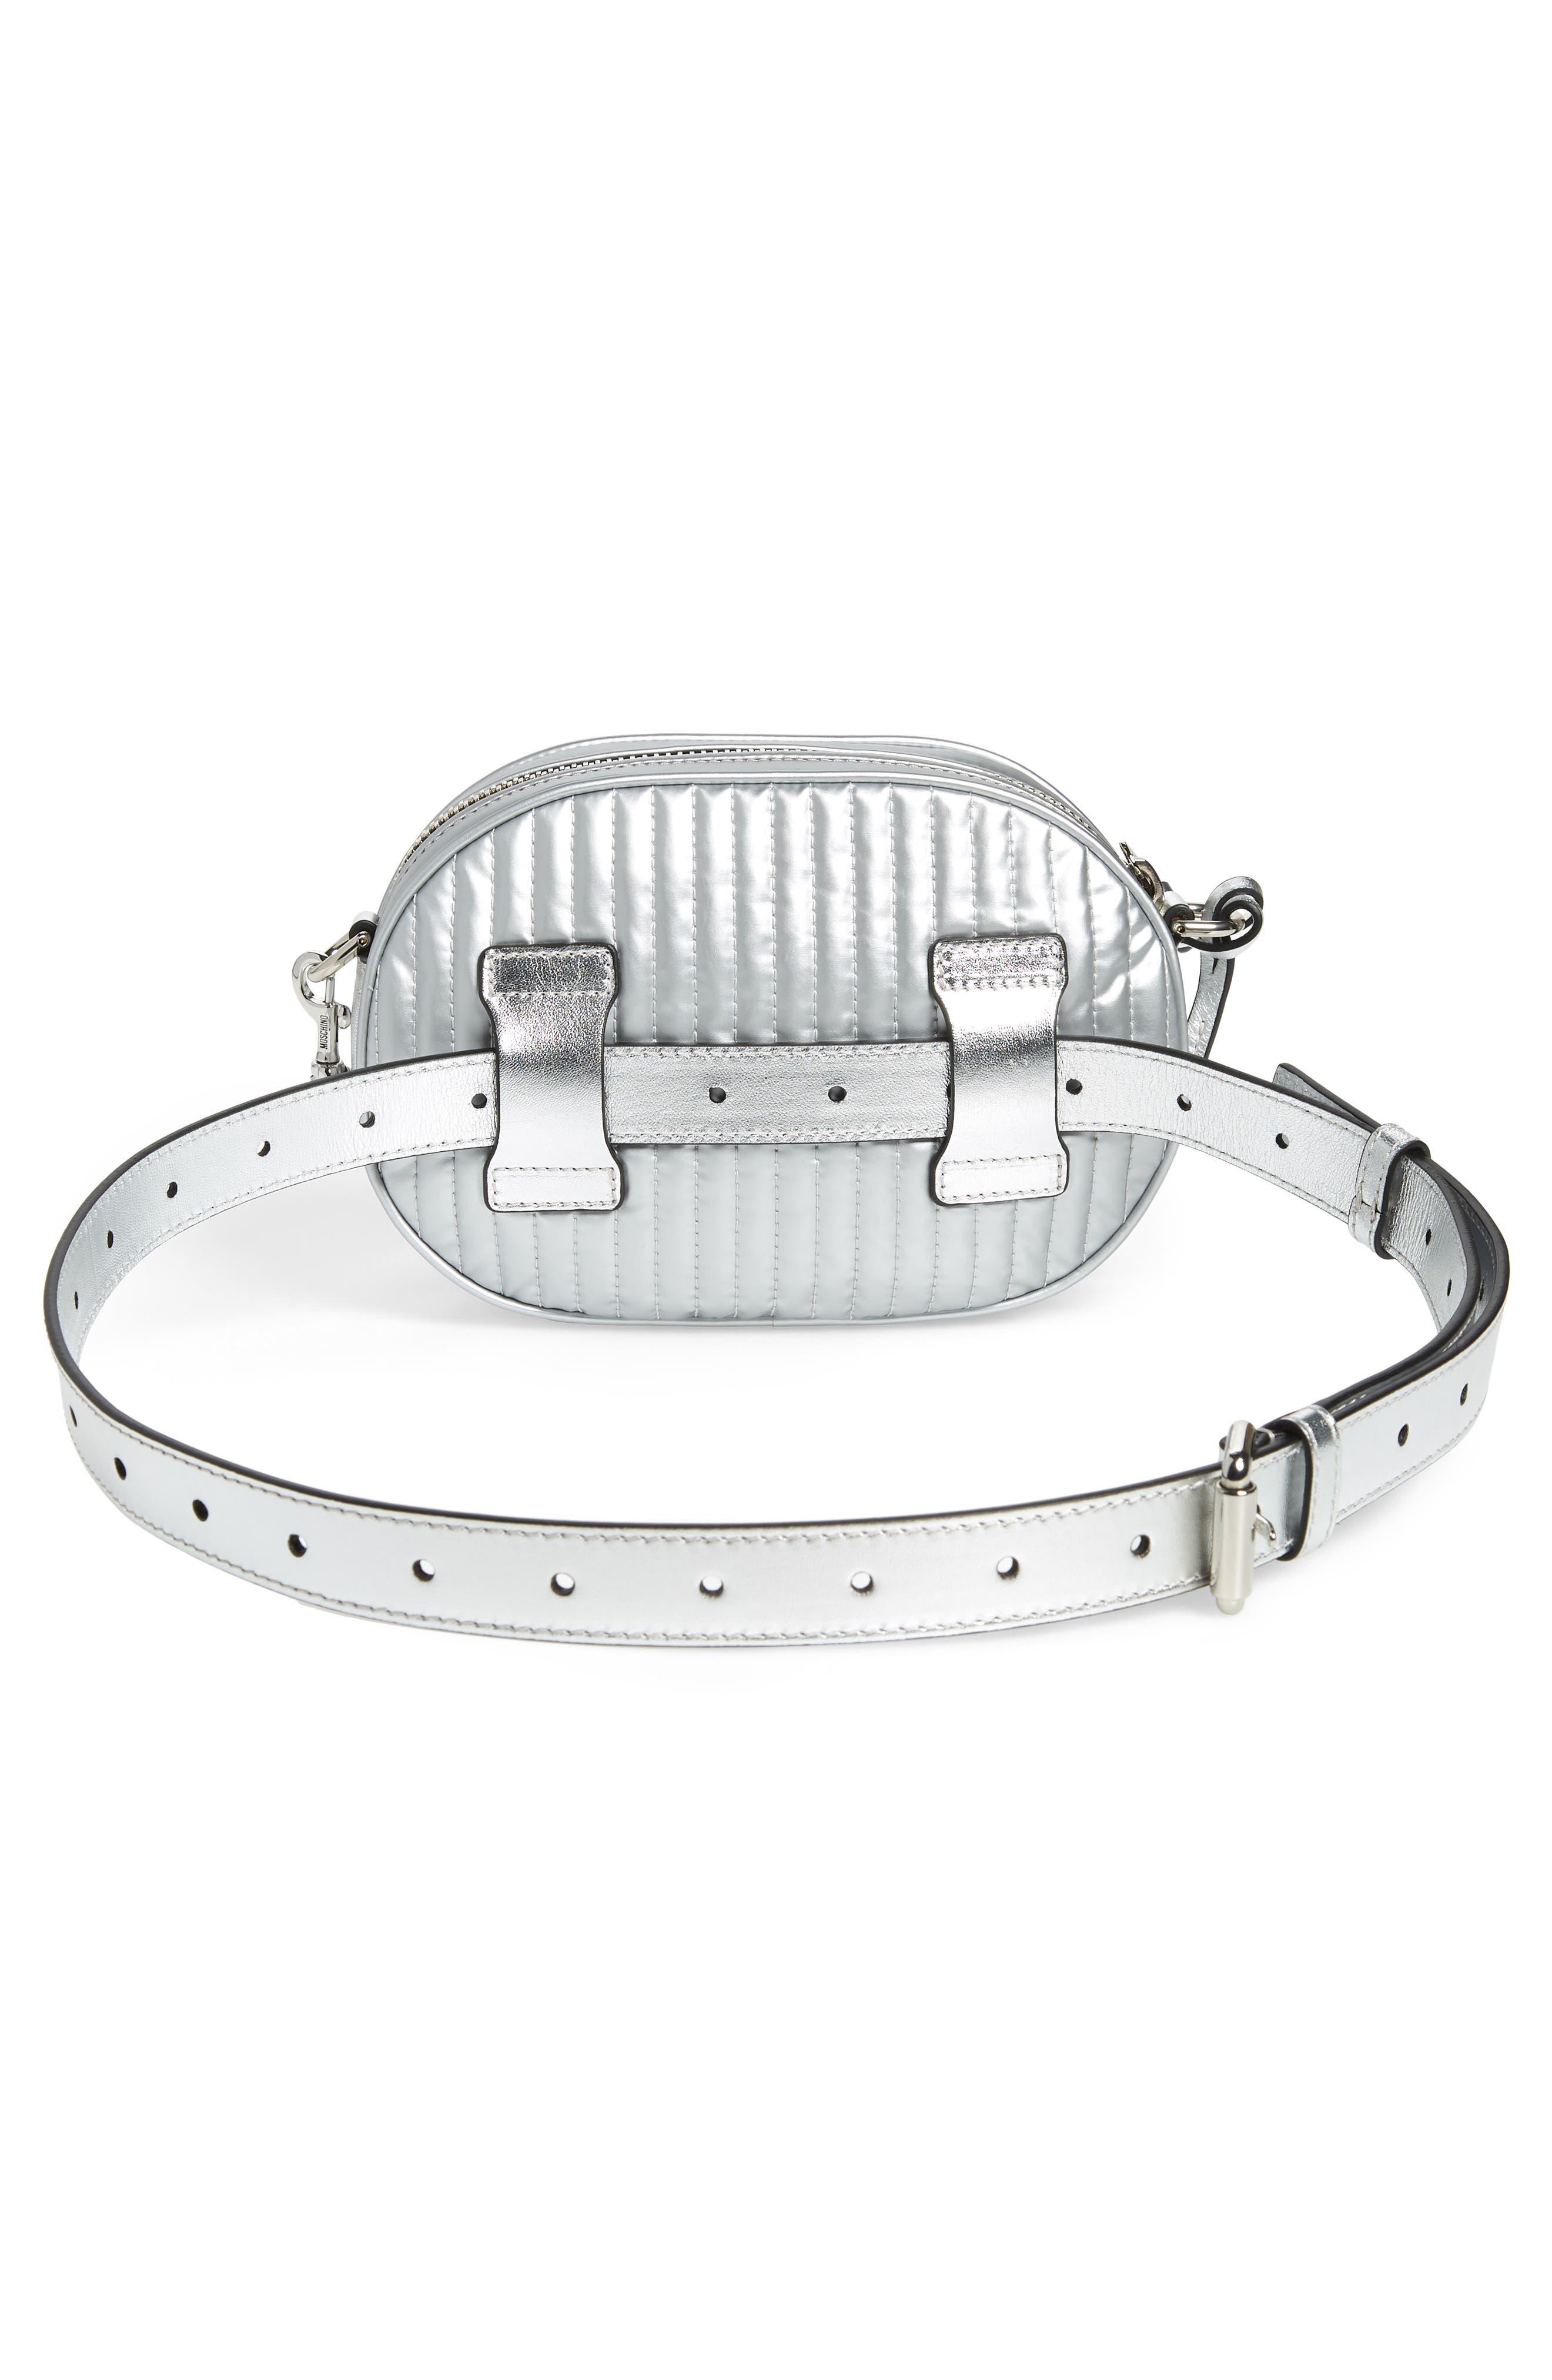 Silver Teddy Belt Bag,                             Alternate thumbnail 4, color,                             045